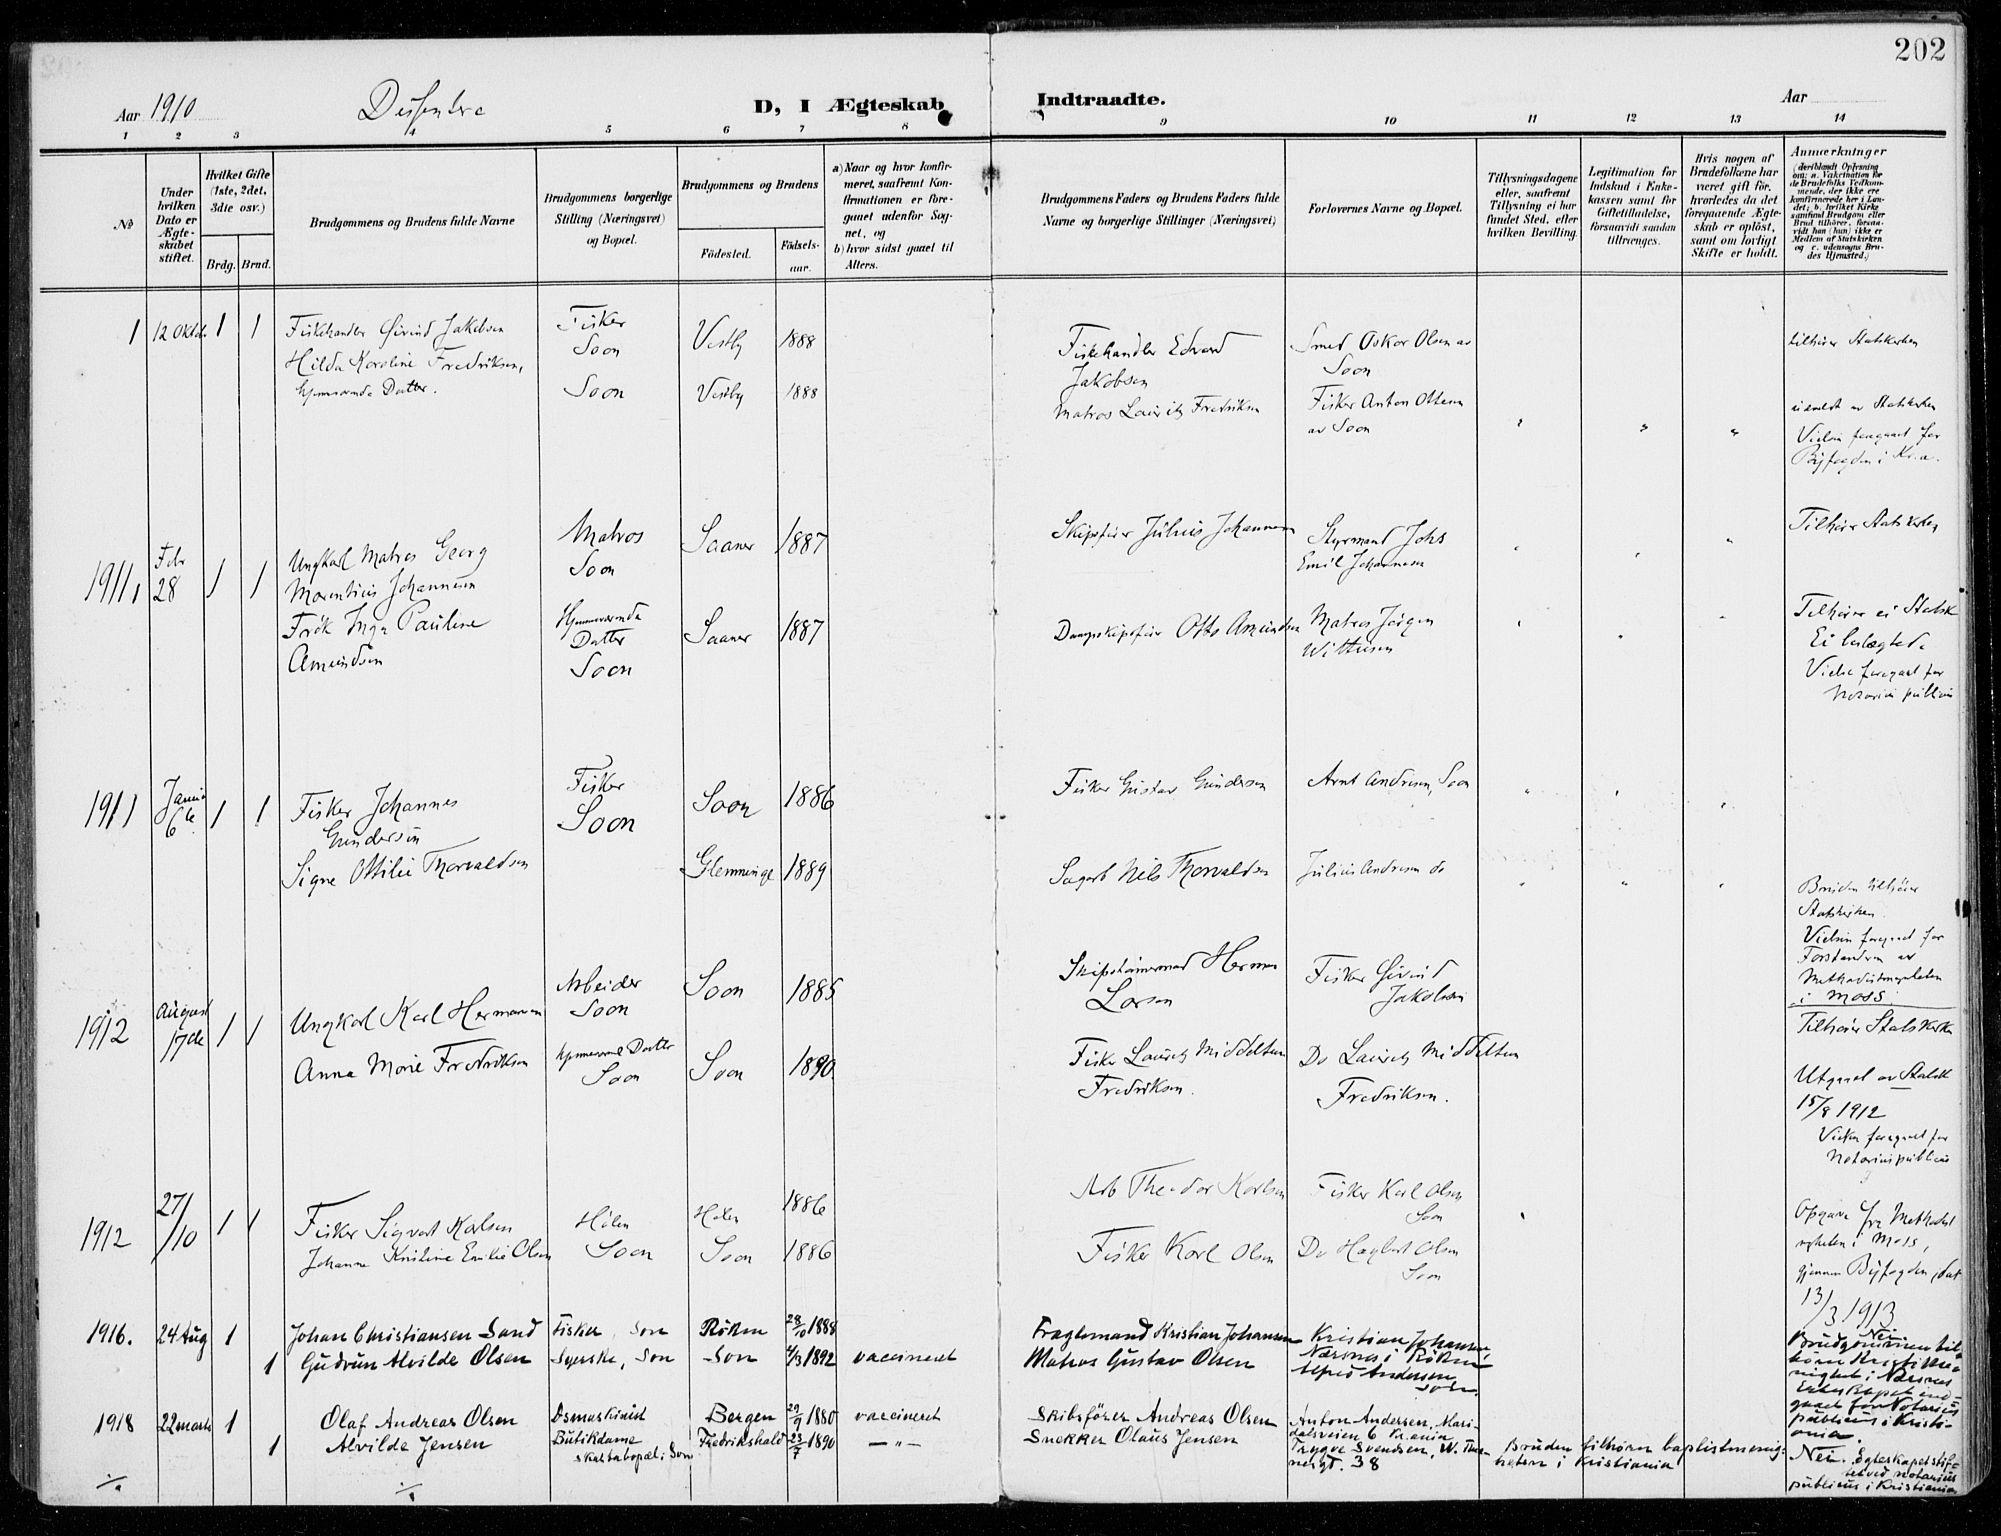 SAO, Vestby prestekontor Kirkebøker, F/Fc/L0002: Ministerialbok nr. III 2, 1906-1940, s. 202